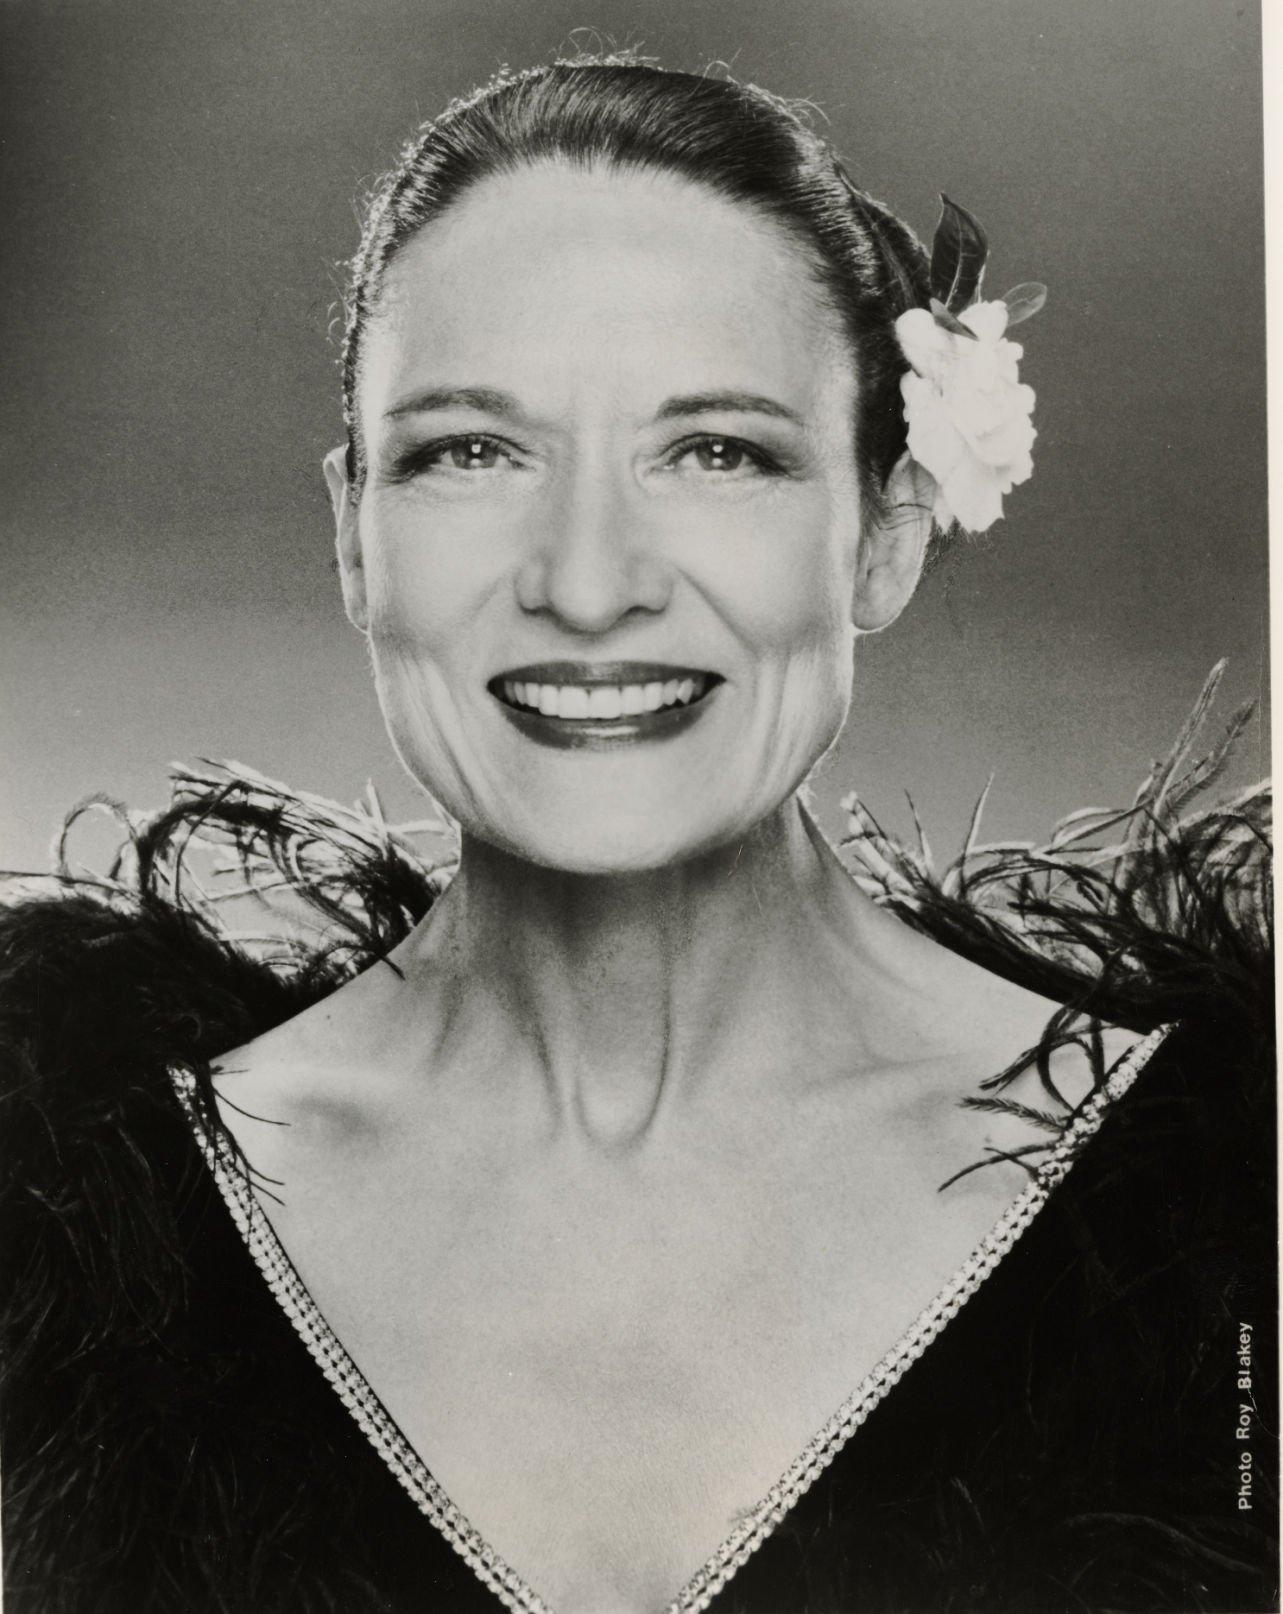 Vivian Vance images